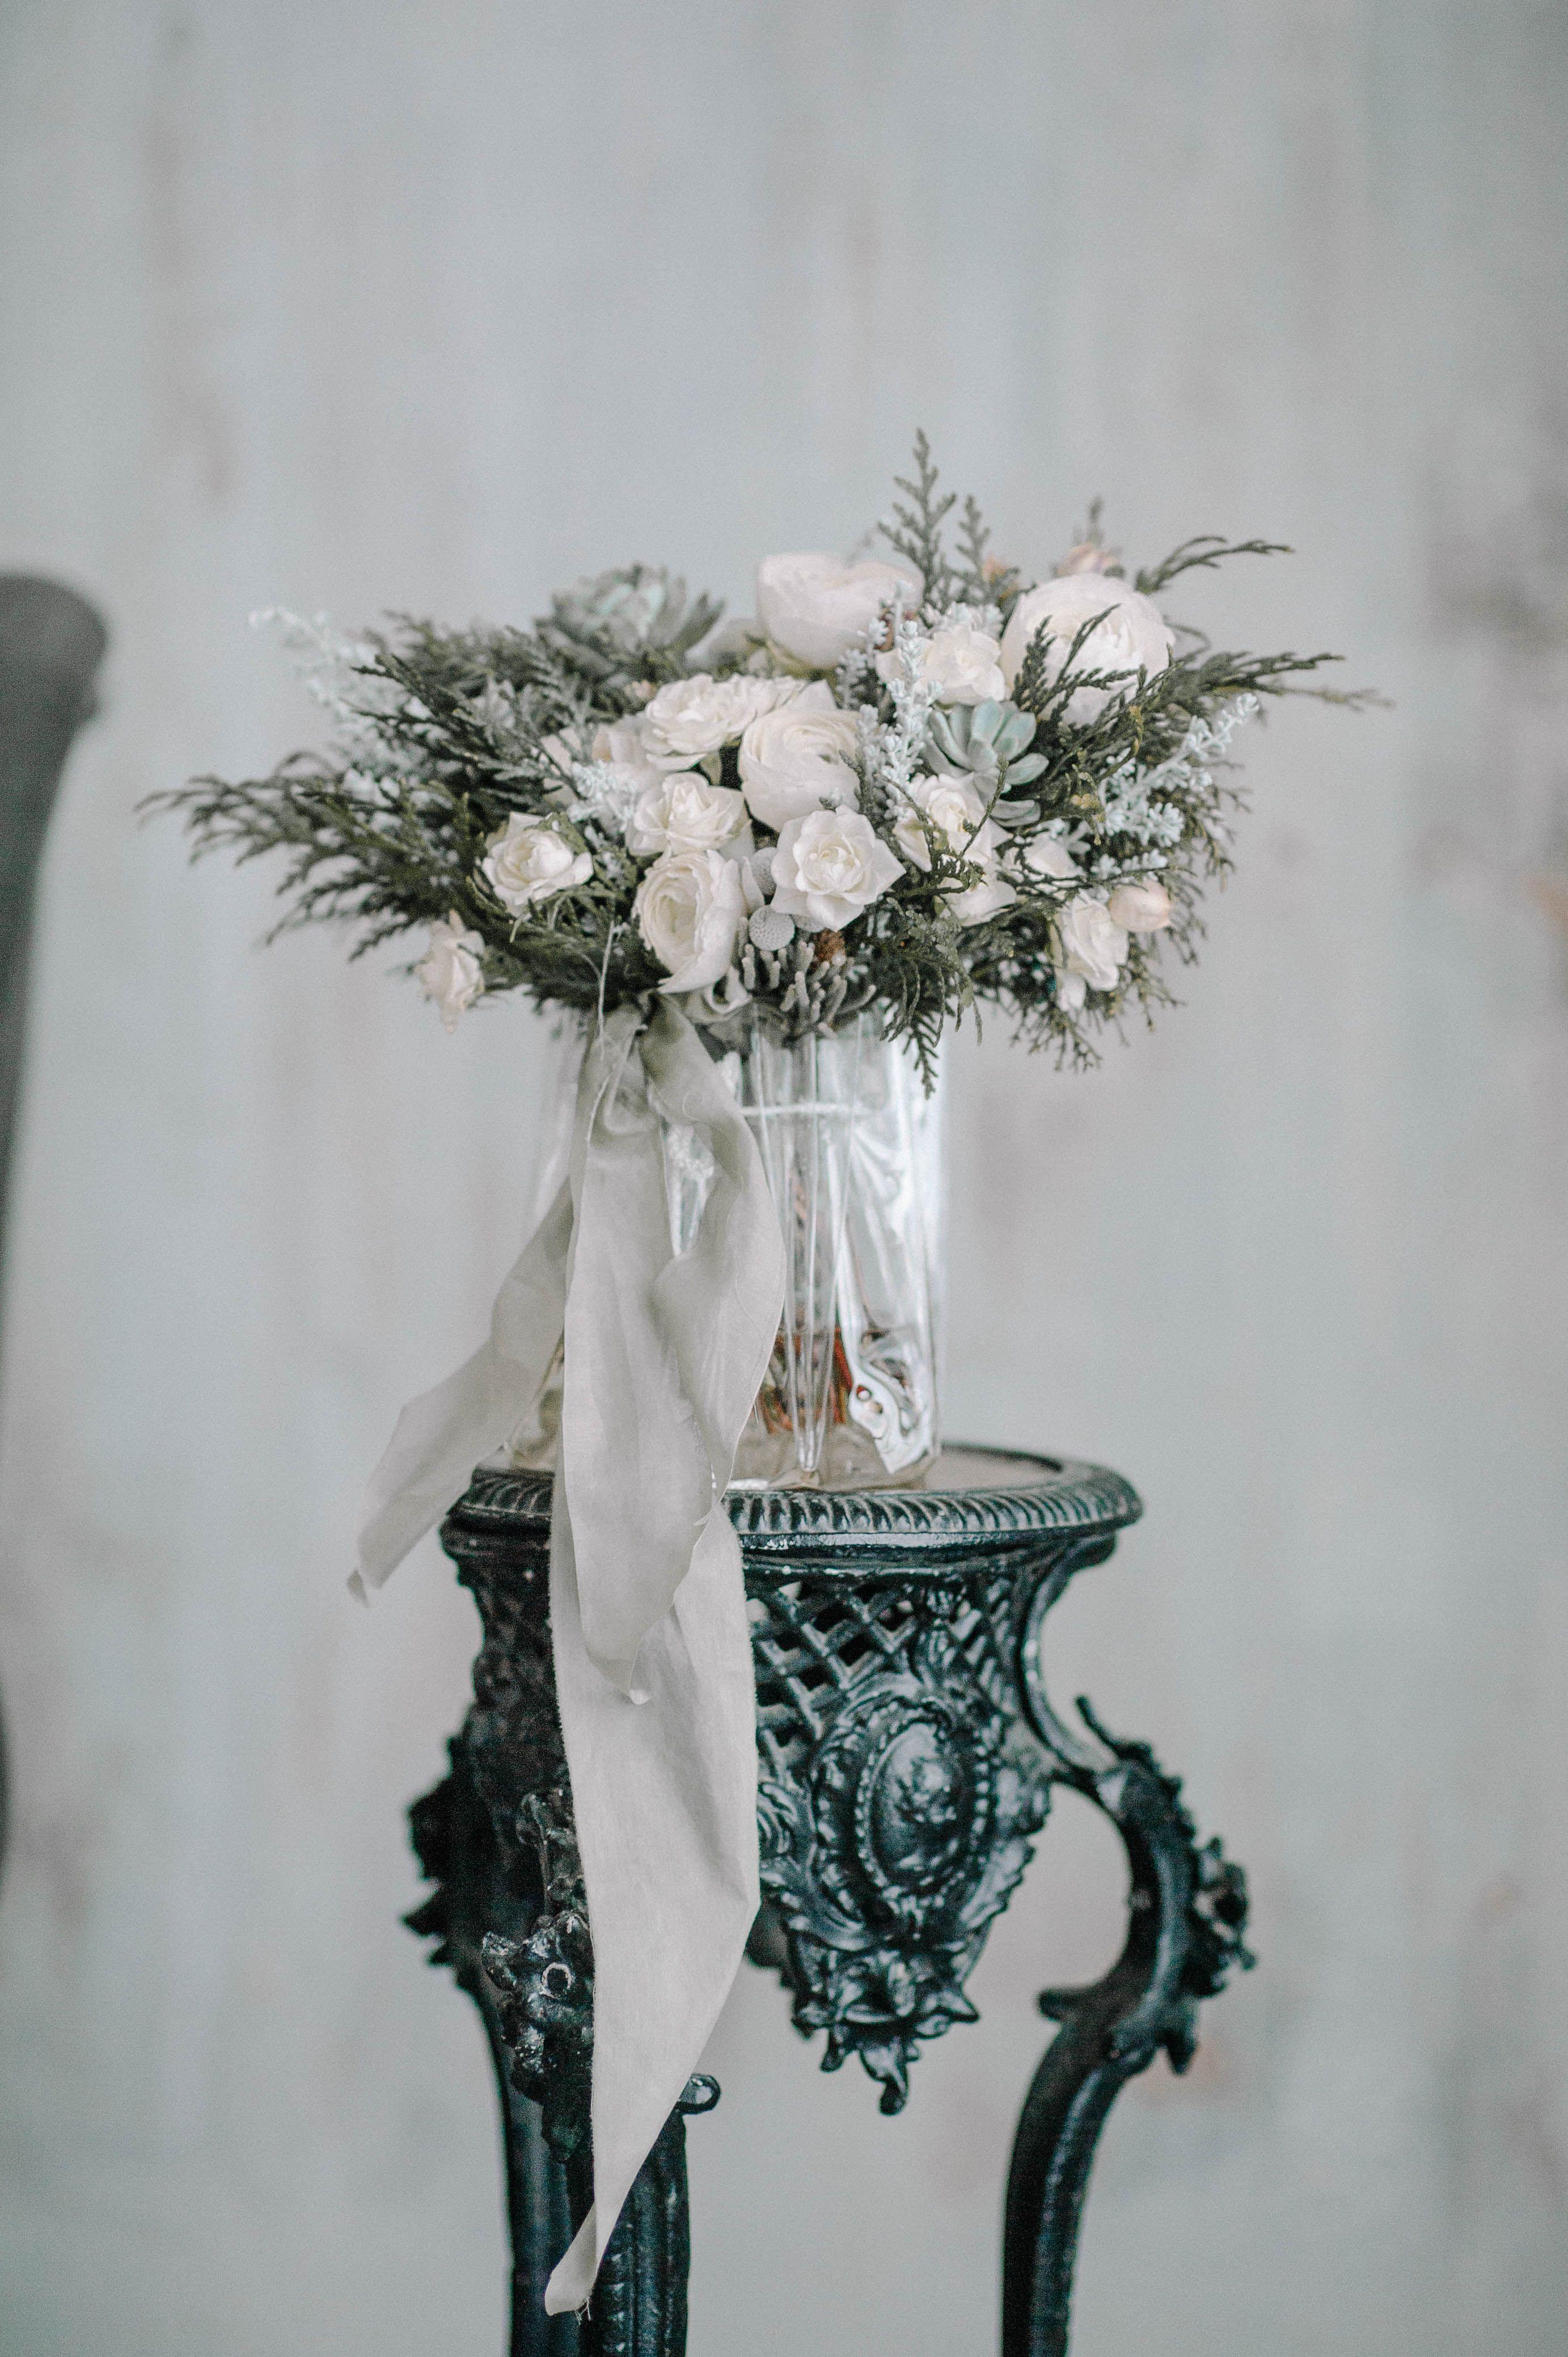 Fine art flowers by Kristina Khananeina Photograped by www